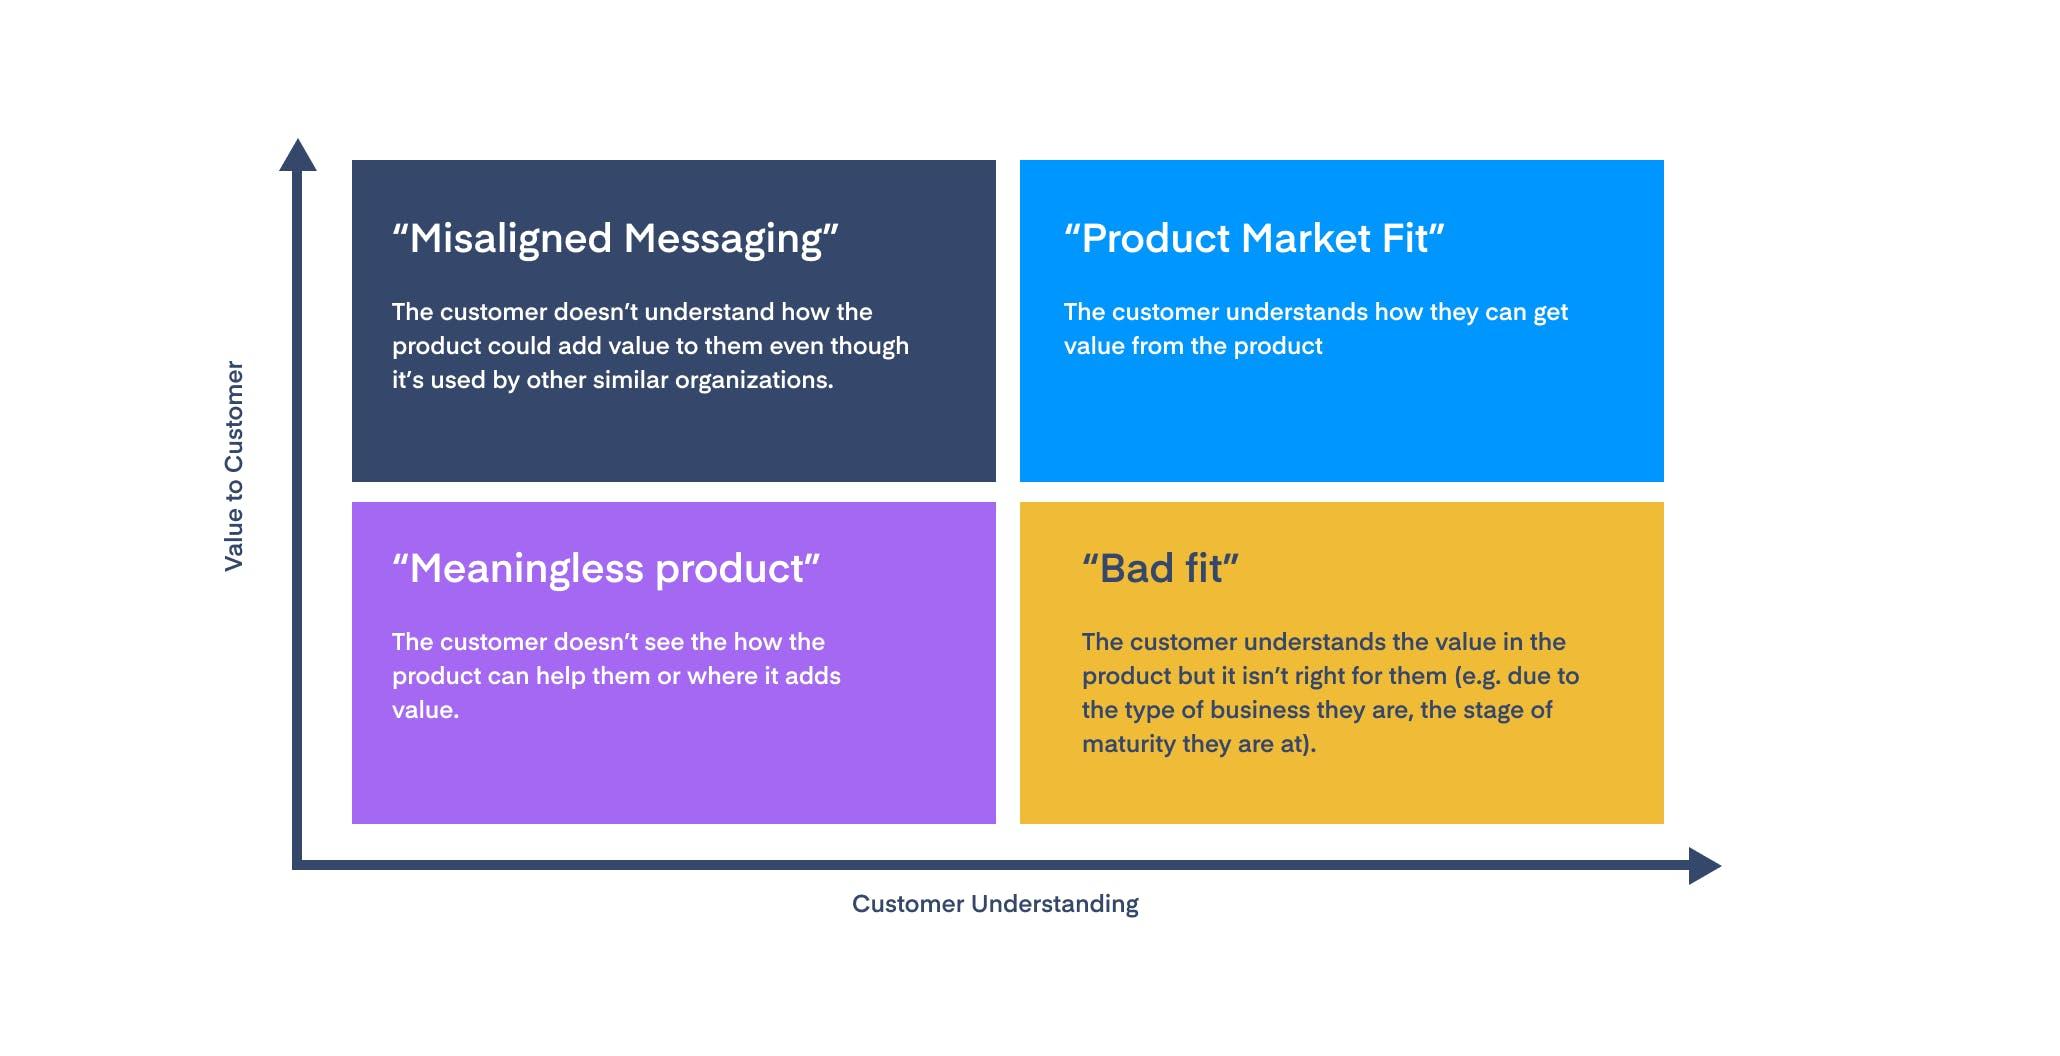 Product market fit: Value to customer vs customer understanding